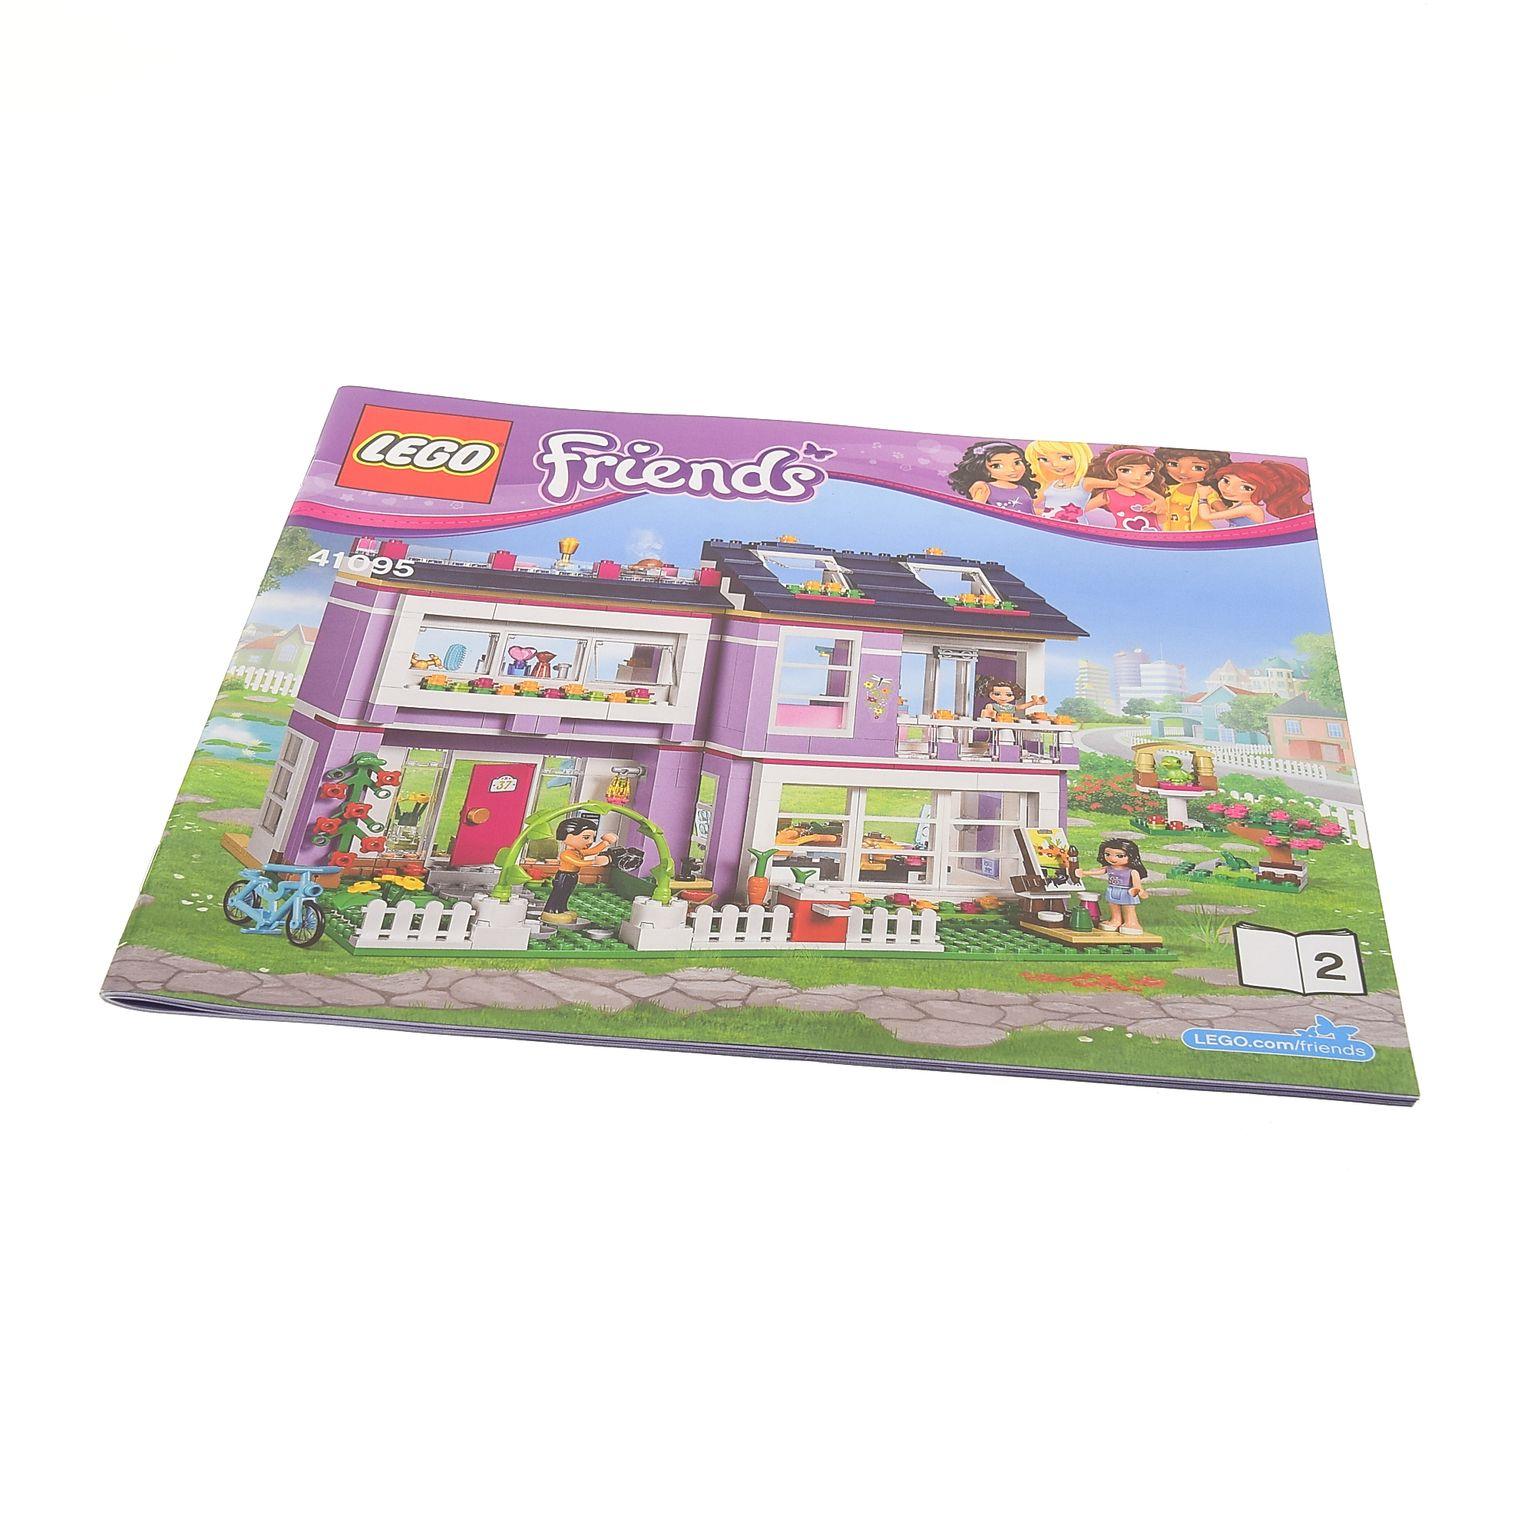 LEGO/DUPLO Spezialist | 1 x Lego brick Instructions Friends Emma's House  Booklet 2 41095